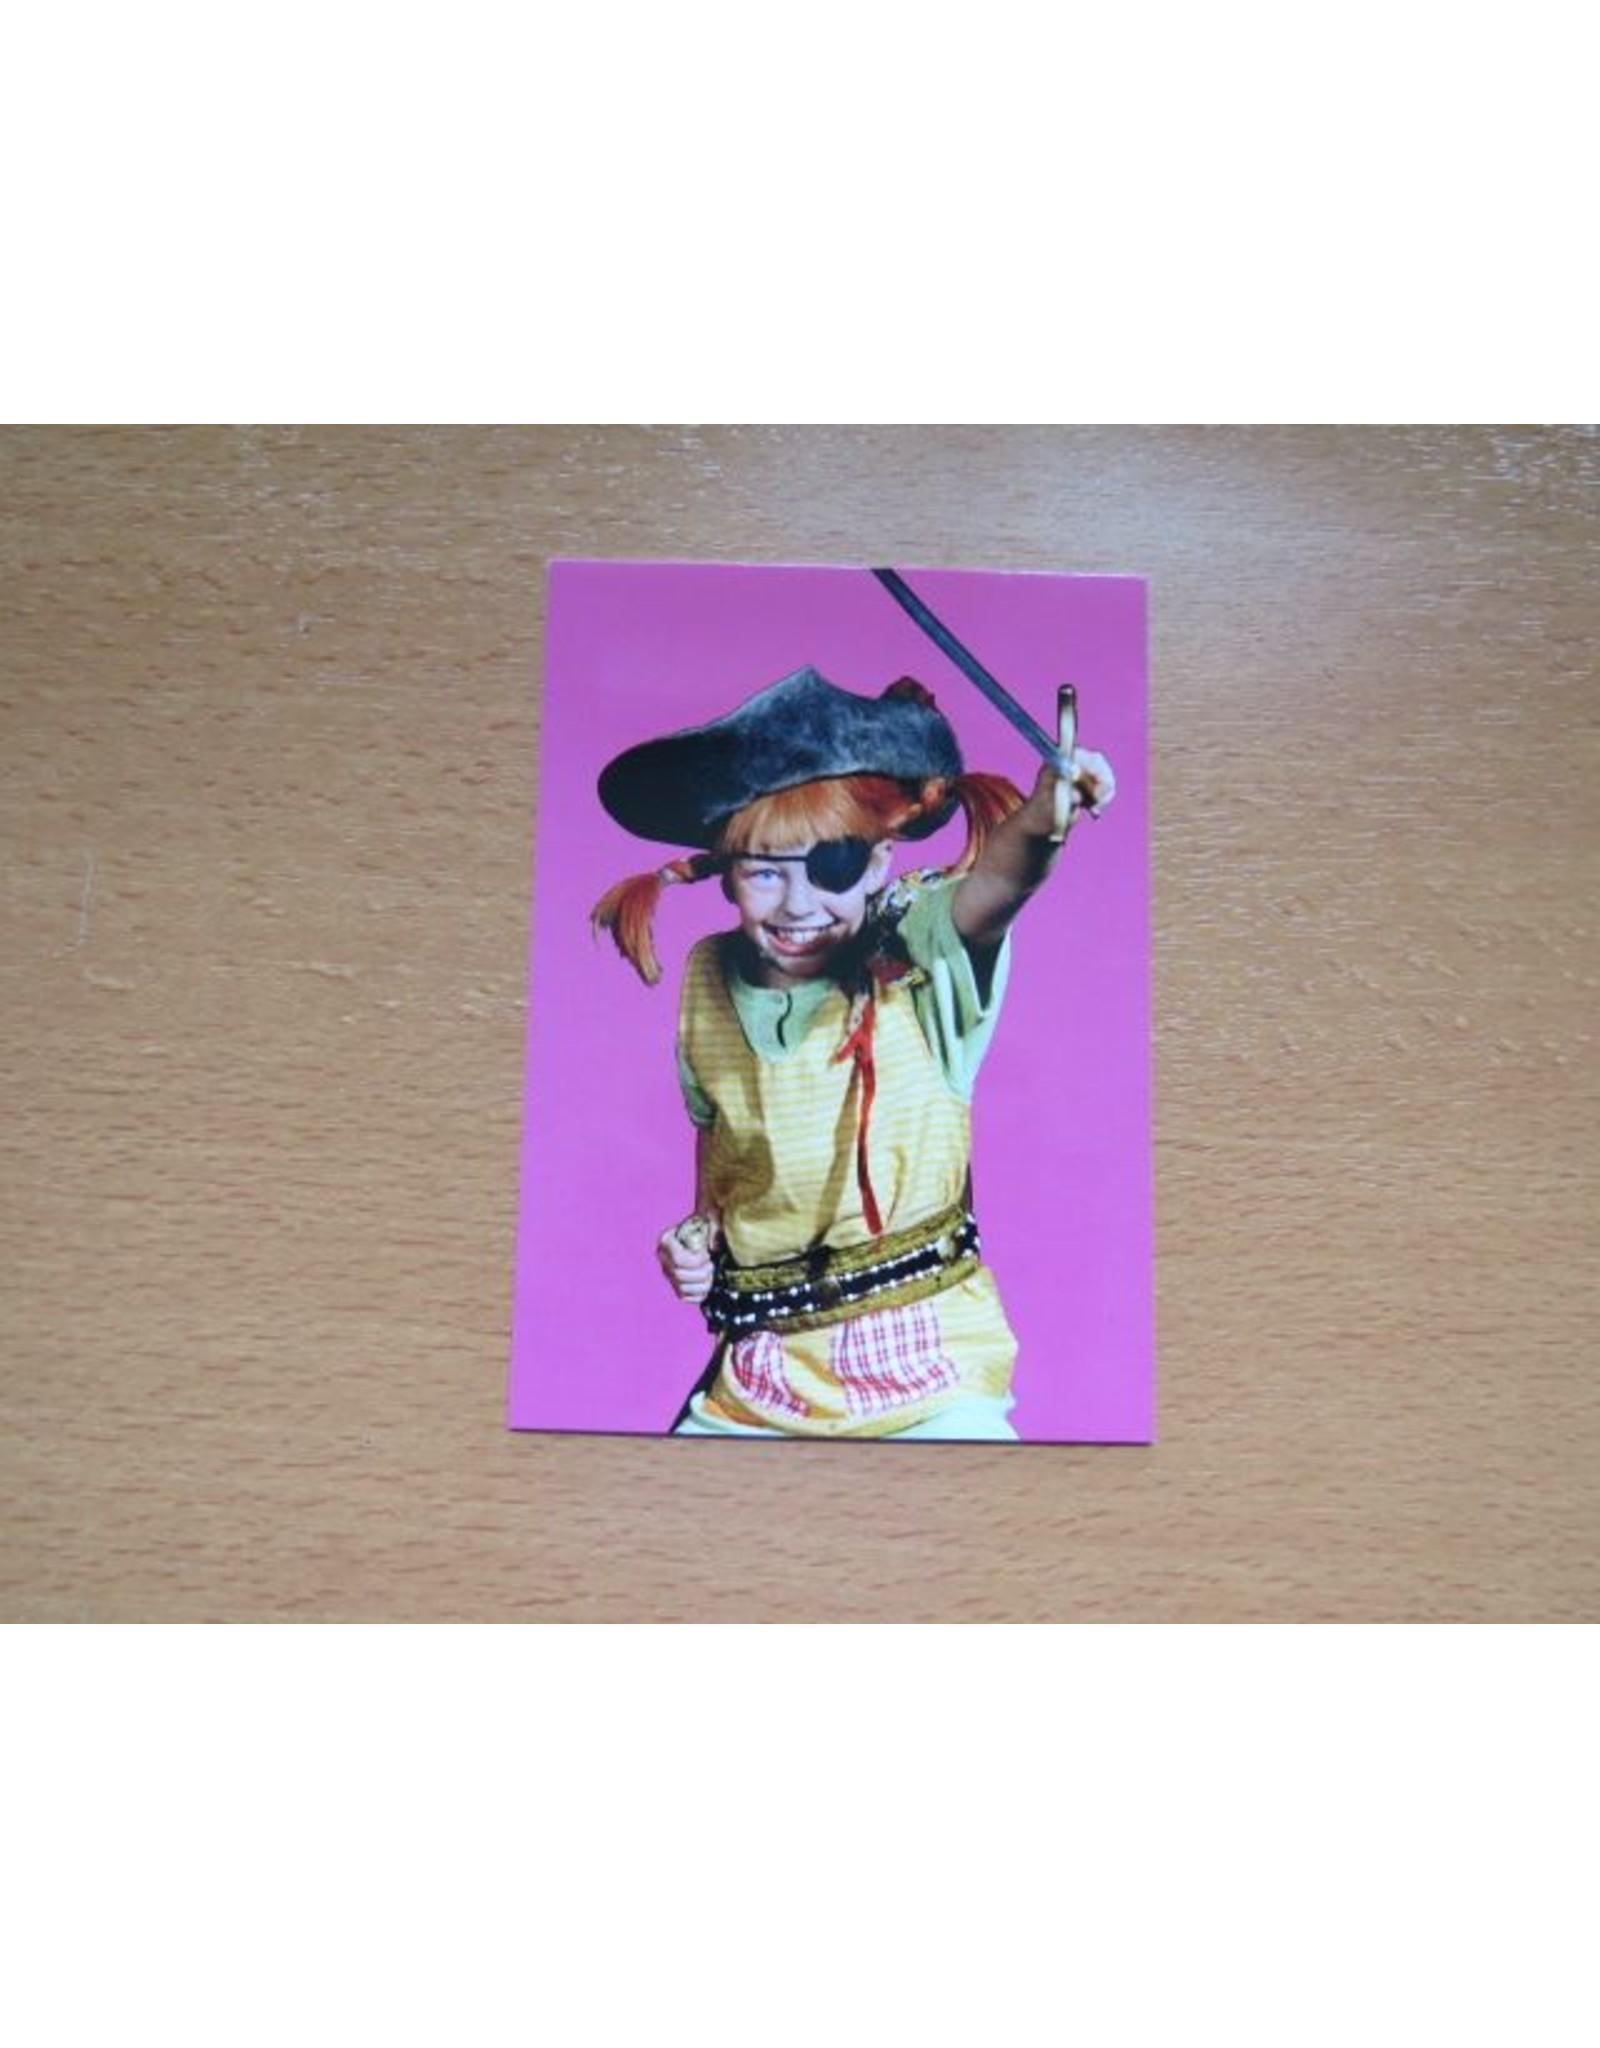 Pippi Langkous Pippi Longstocking card - Attack!